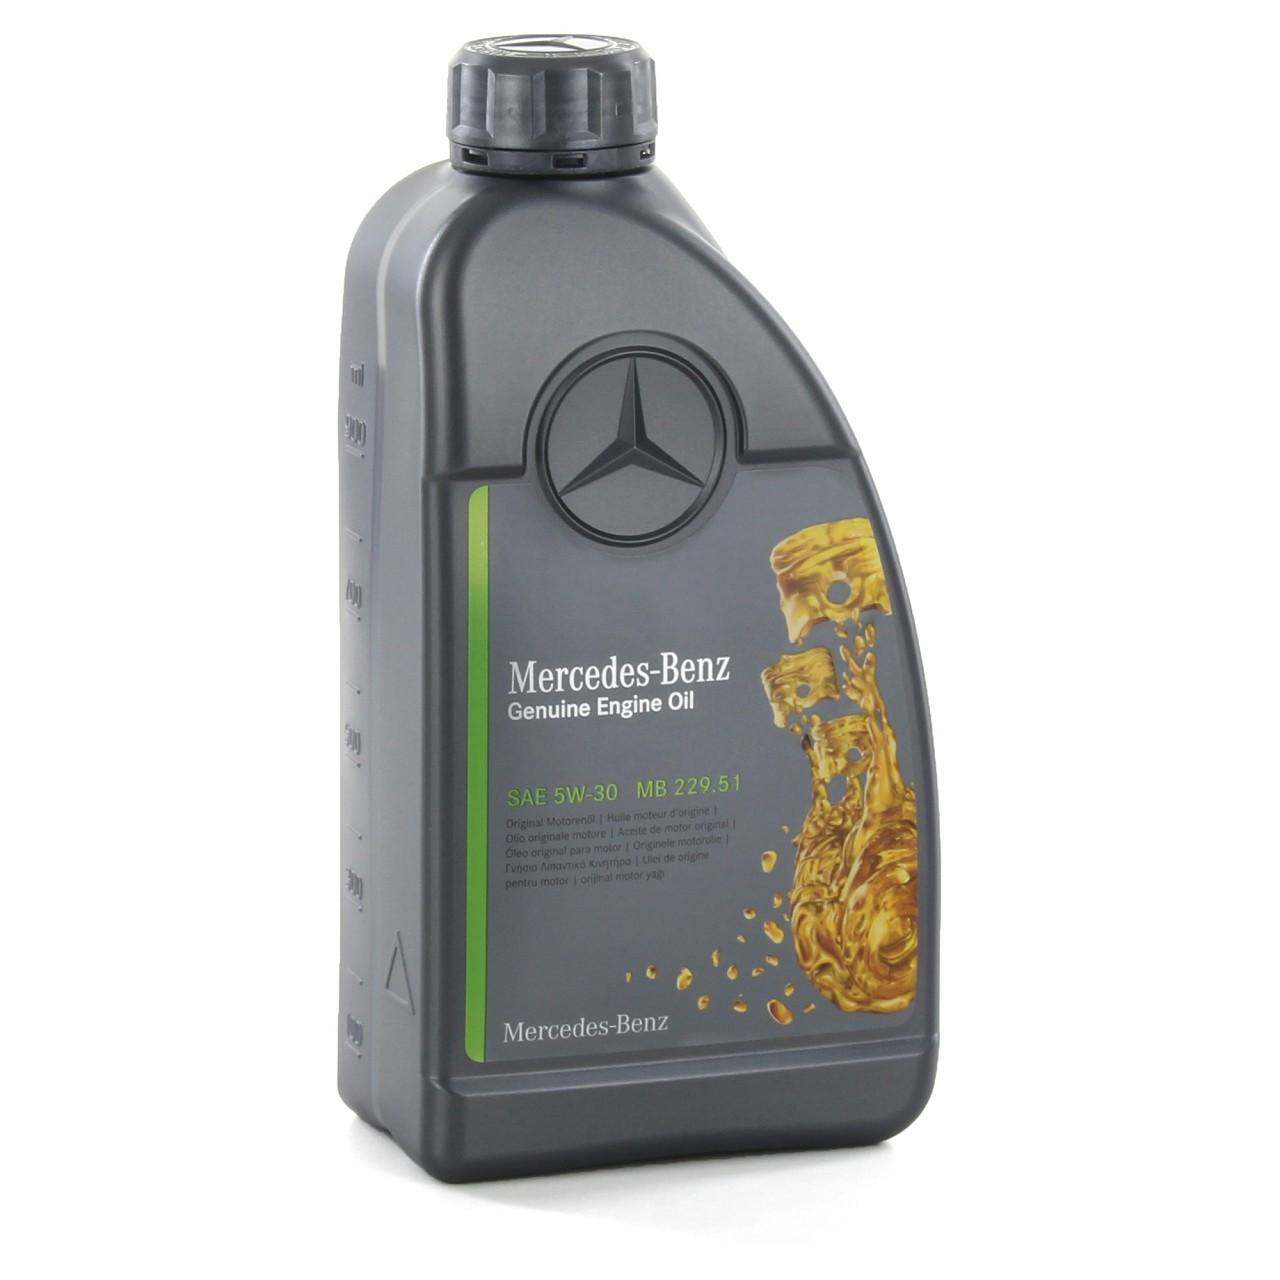 1L 1 Liter ORIGINAL Mercedes-Benz Motoröl Öl 5W-30 MB 229.51 000989940211ALEE